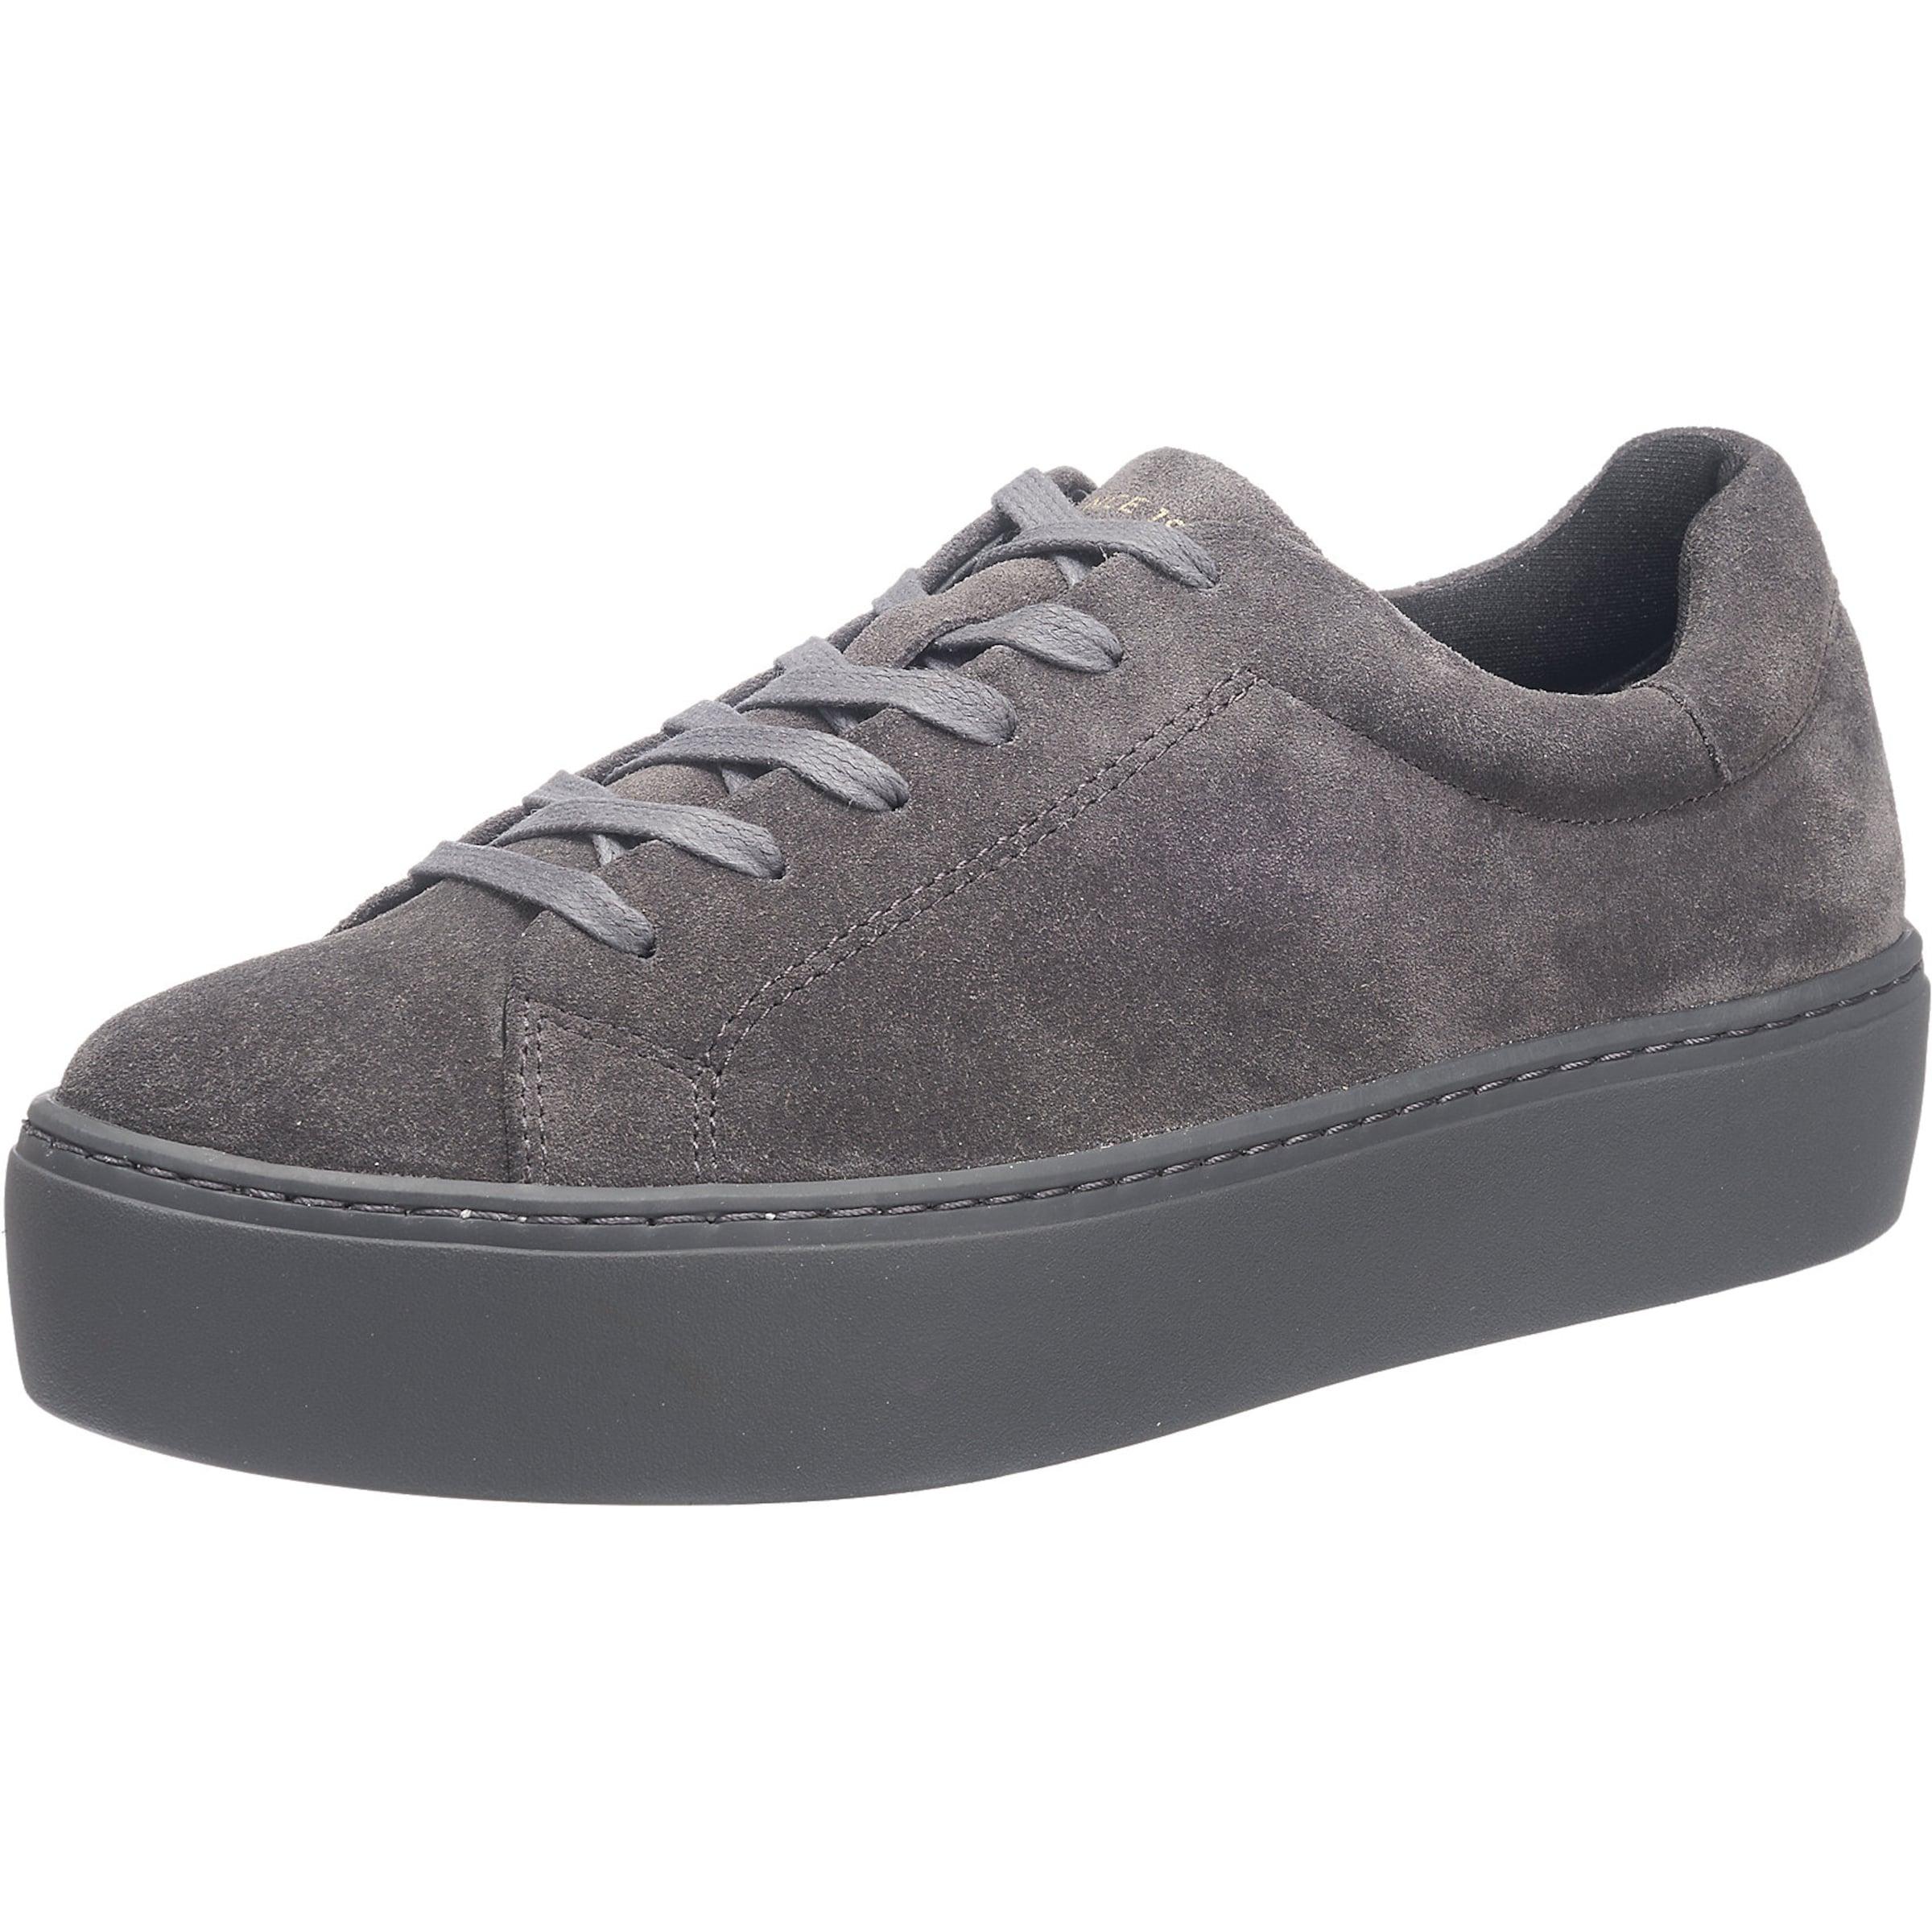 VAGABOND SHOEMAKERS Jessie Sneakers